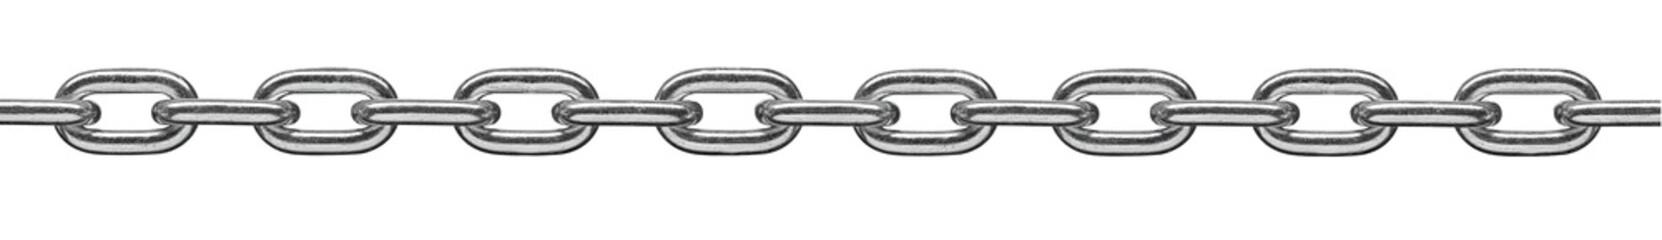 chain link metal steel